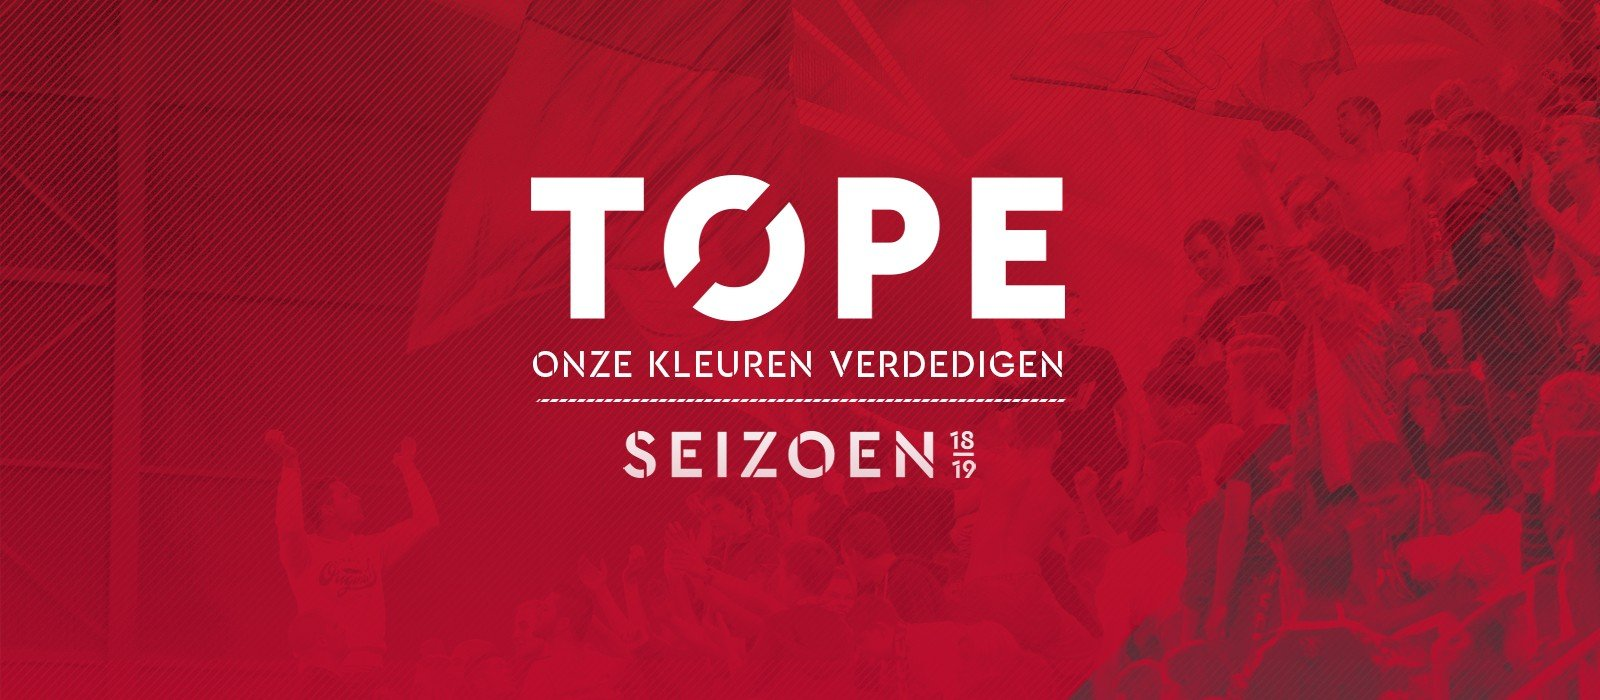 Banner_TOPE_abo1819.jpg